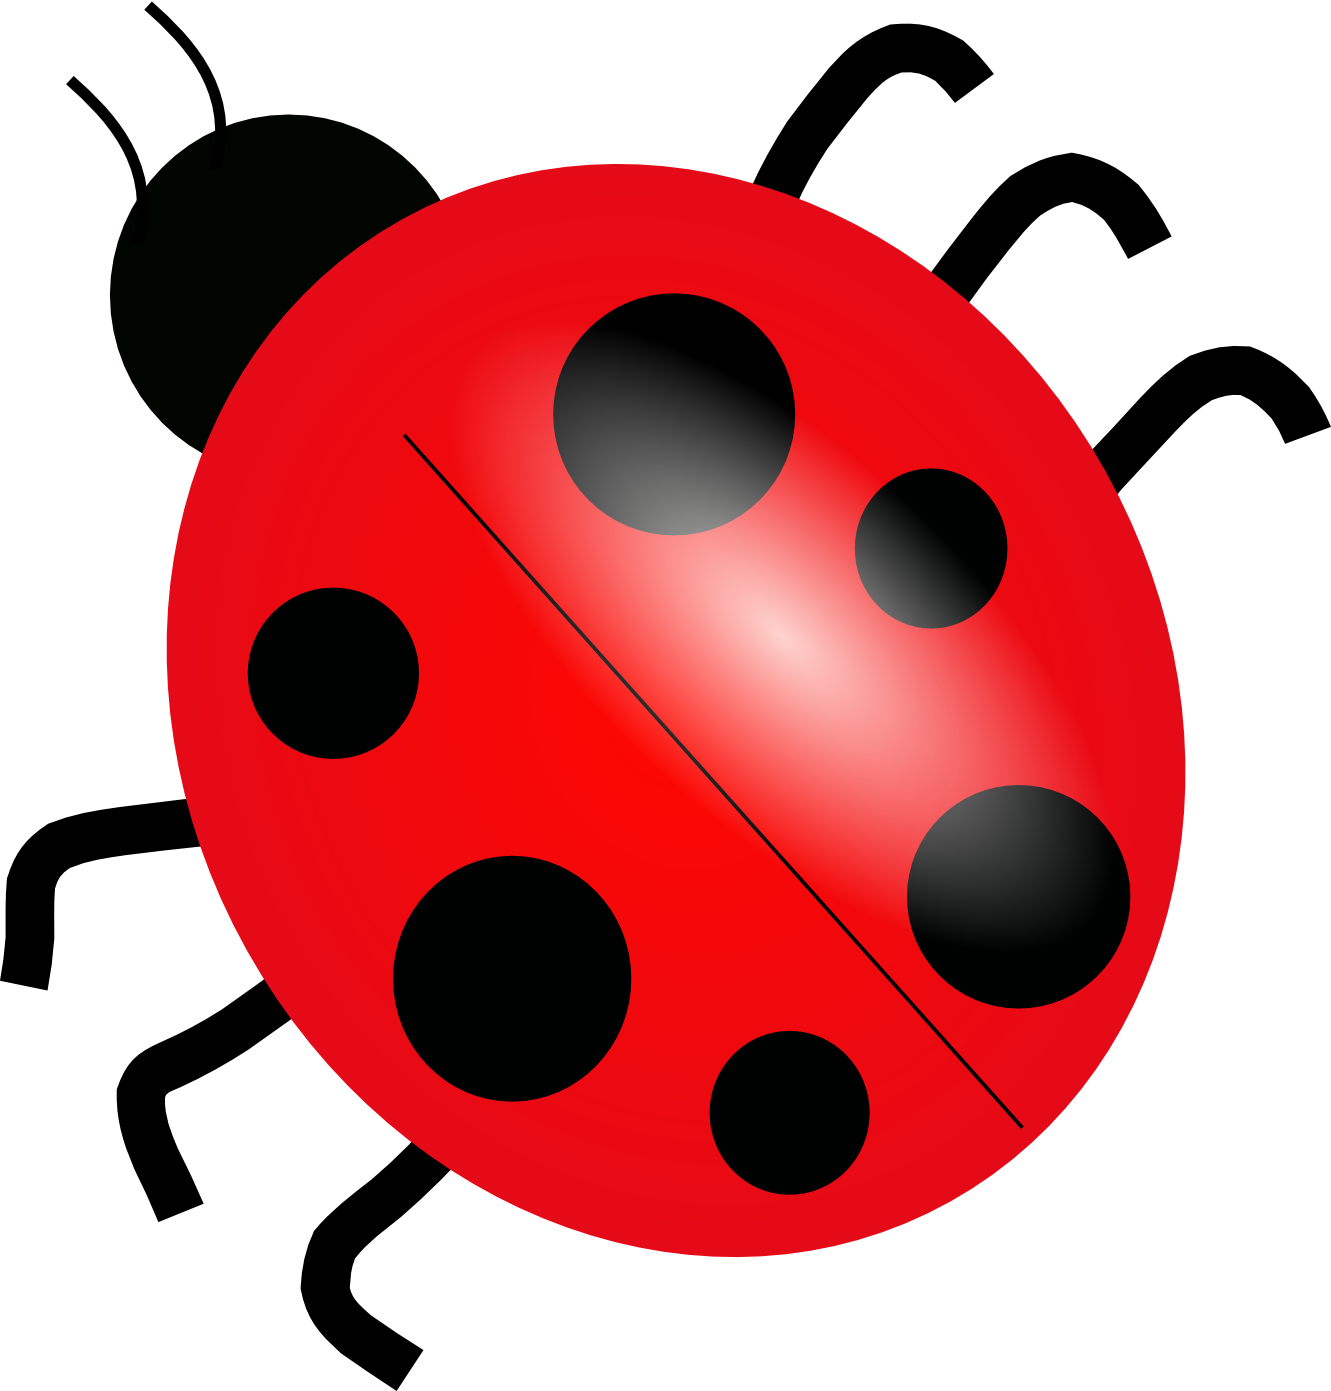 Clipart Info - Ladybug HD PNG